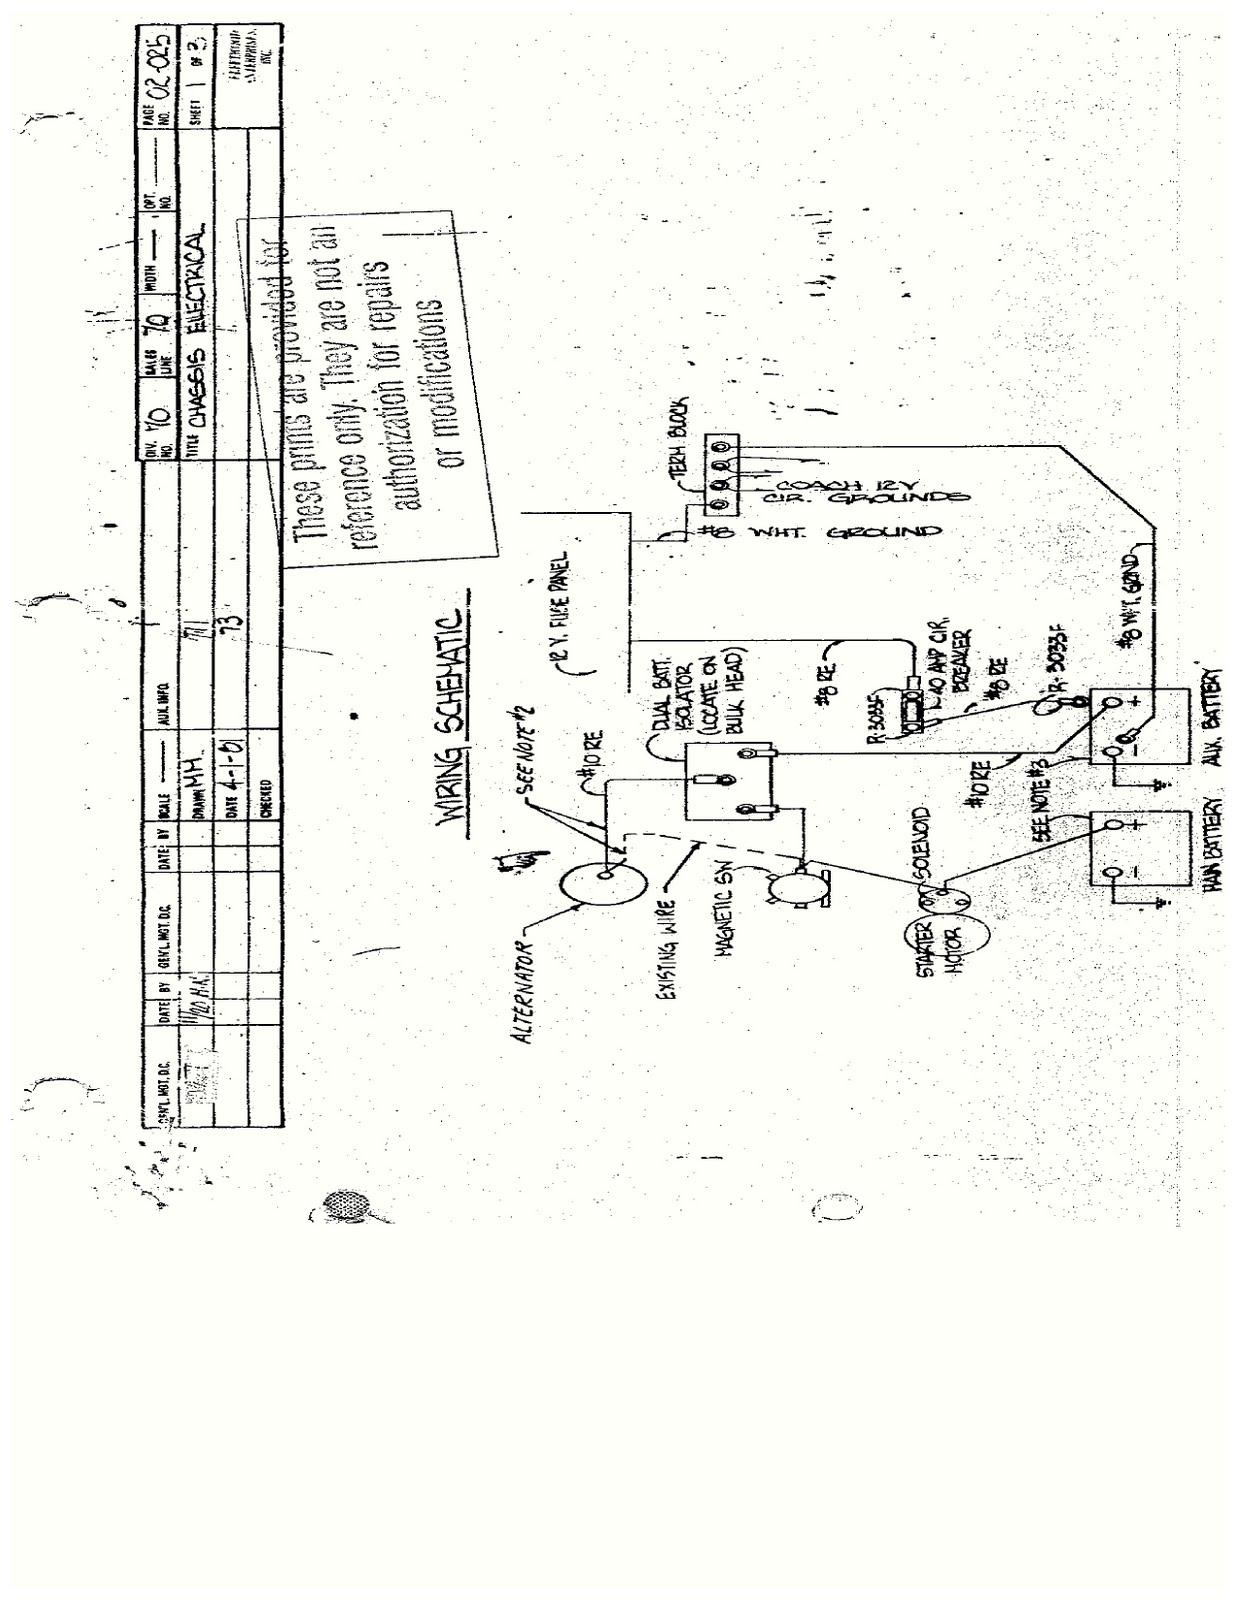 Diagram 1992 Fleetwood Pace Arrow Wiring Diagram Full Version Hd Quality Wiring Diagram Ardiagram Lubestoresaronno It